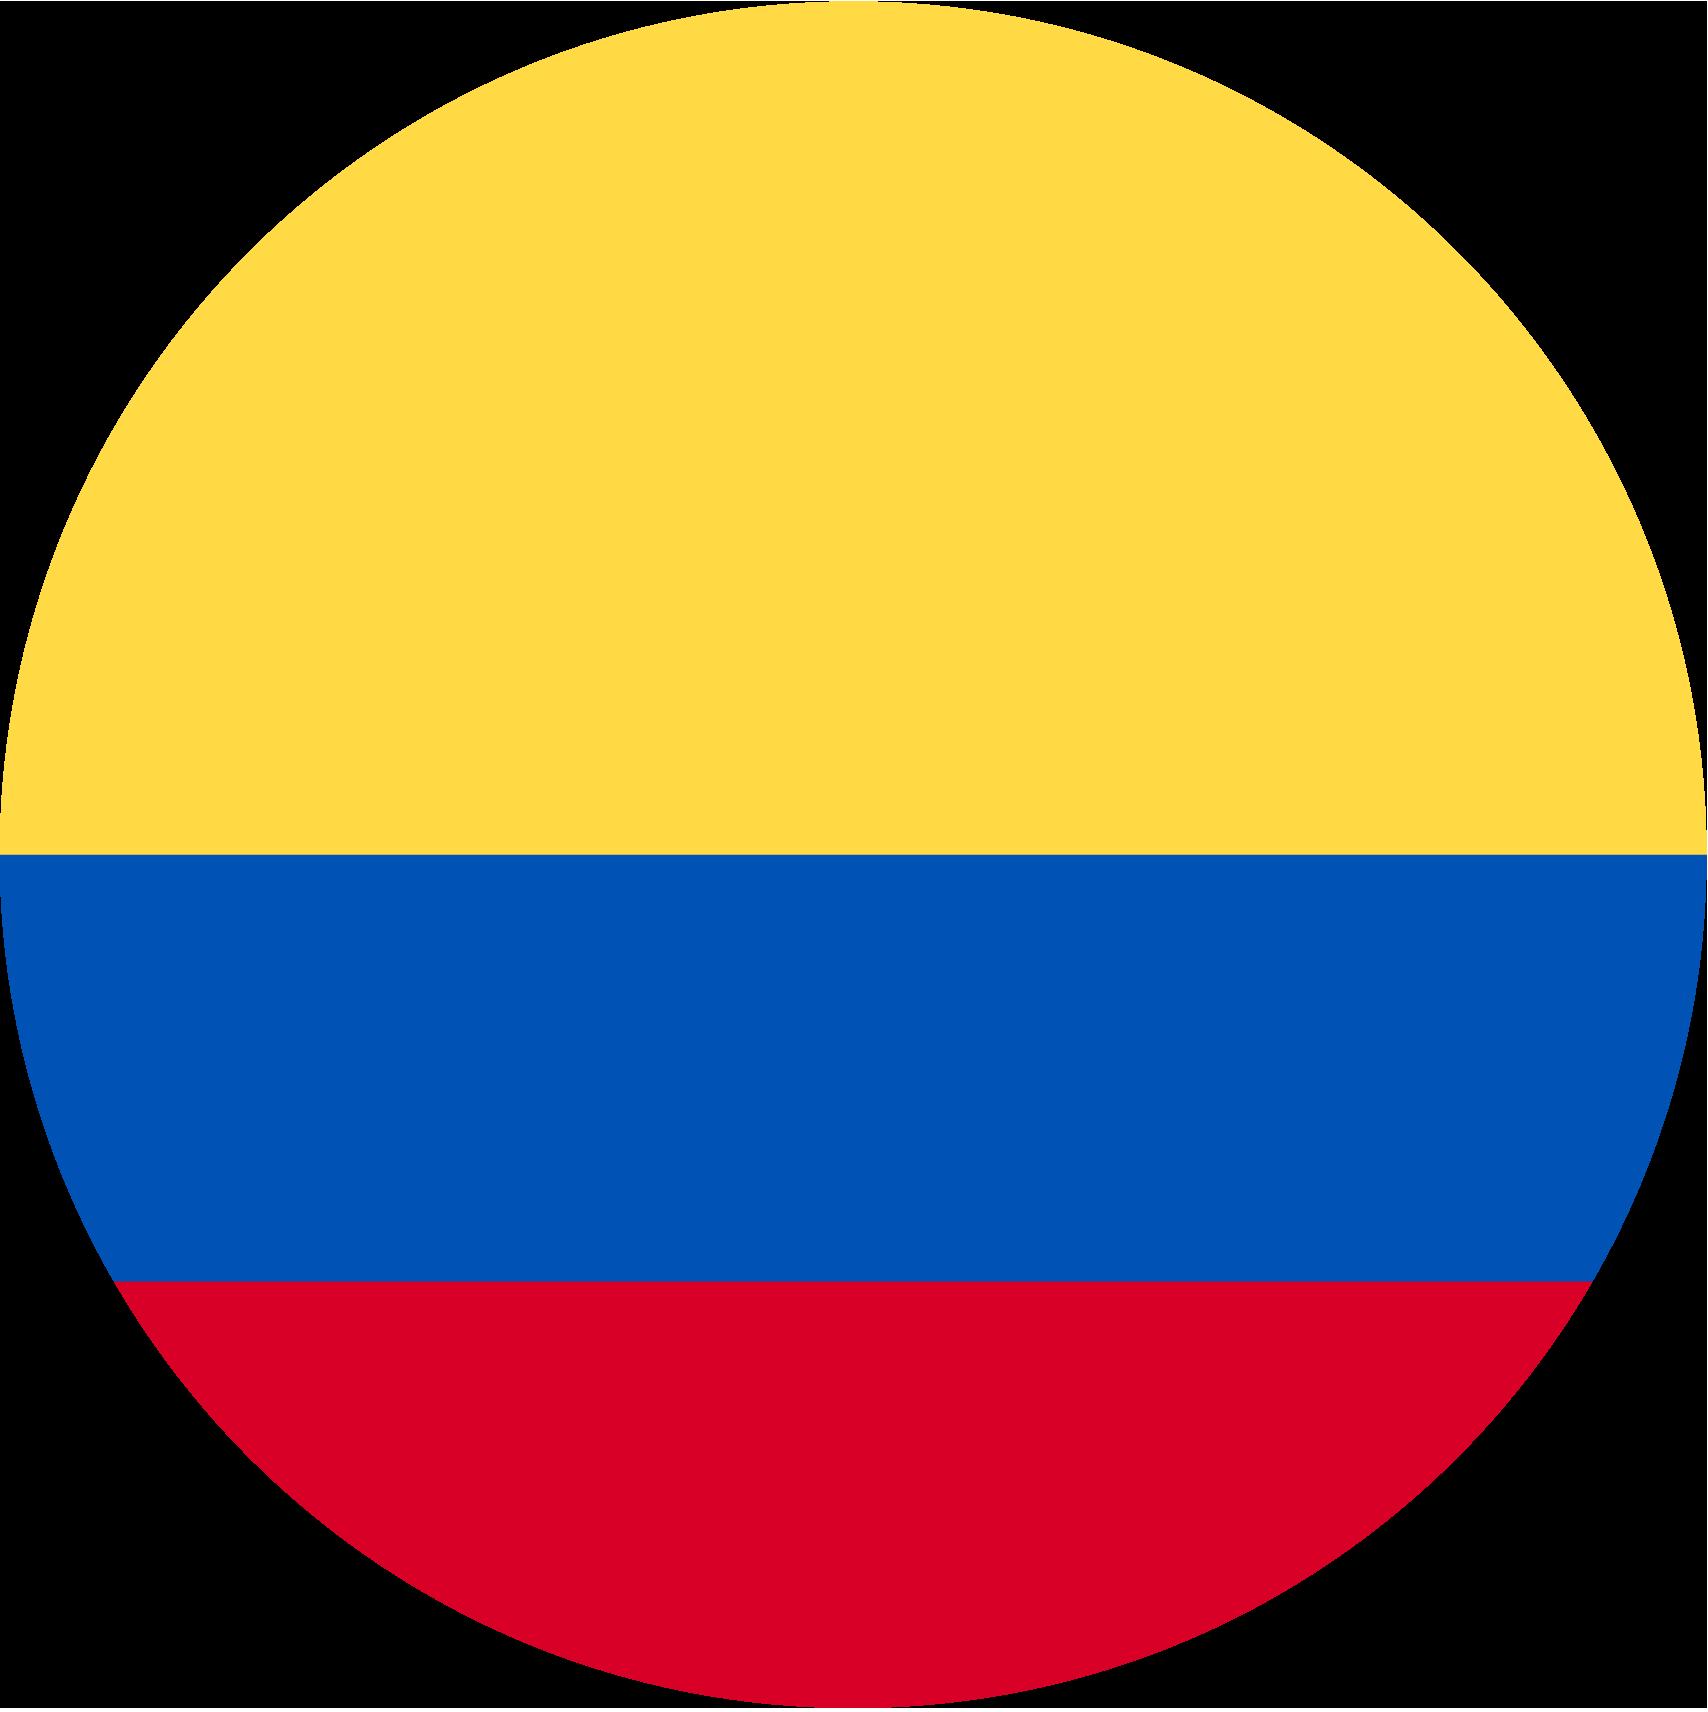 Bandeira da Colombia